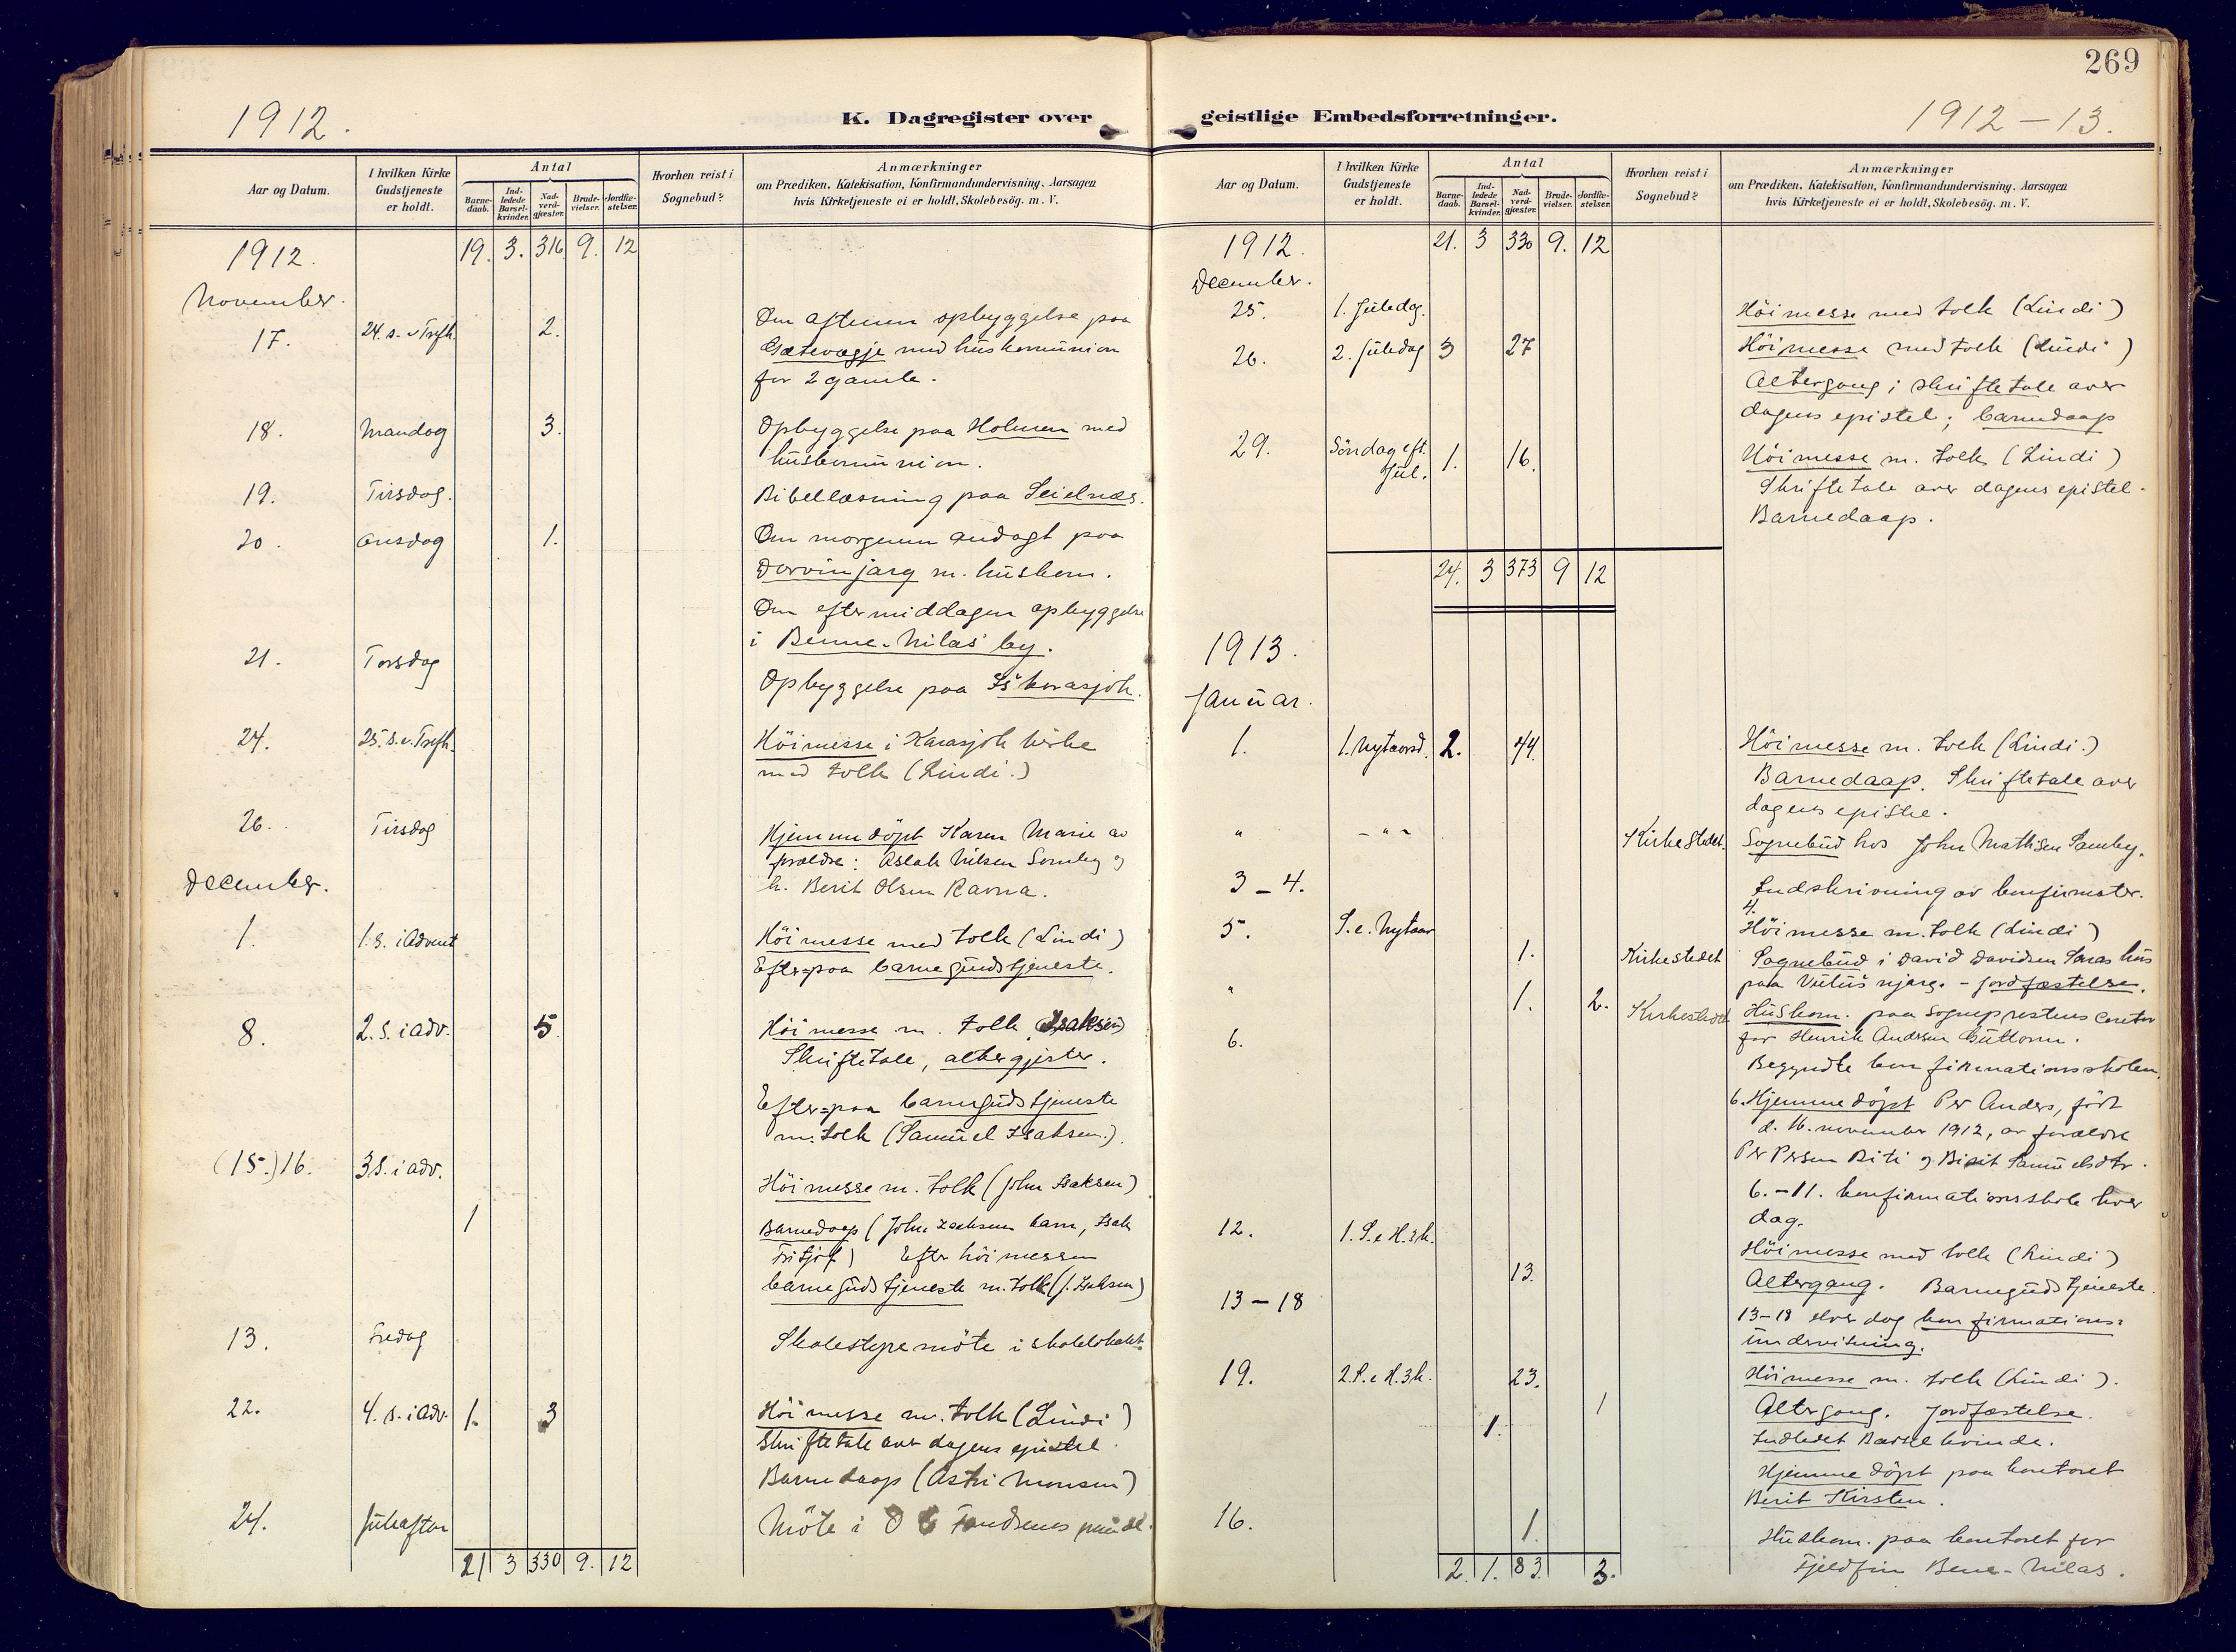 SATØ, Karasjok sokneprestkontor, H/Ha: Ministerialbok nr. 3, 1907-1926, s. 269